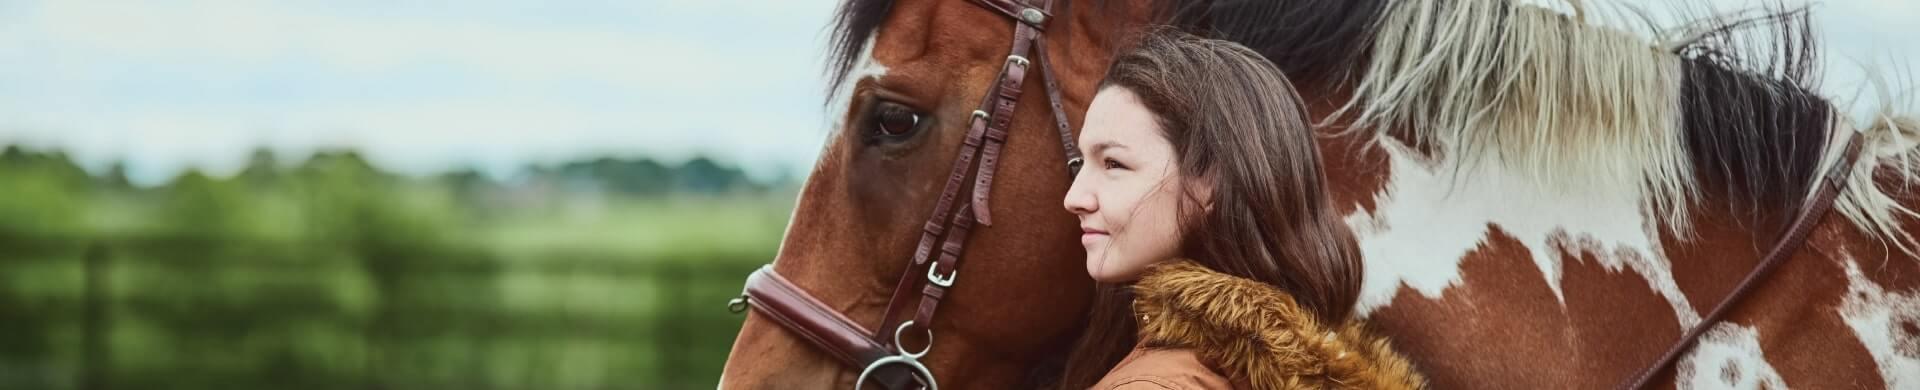 Horse success stories banner image